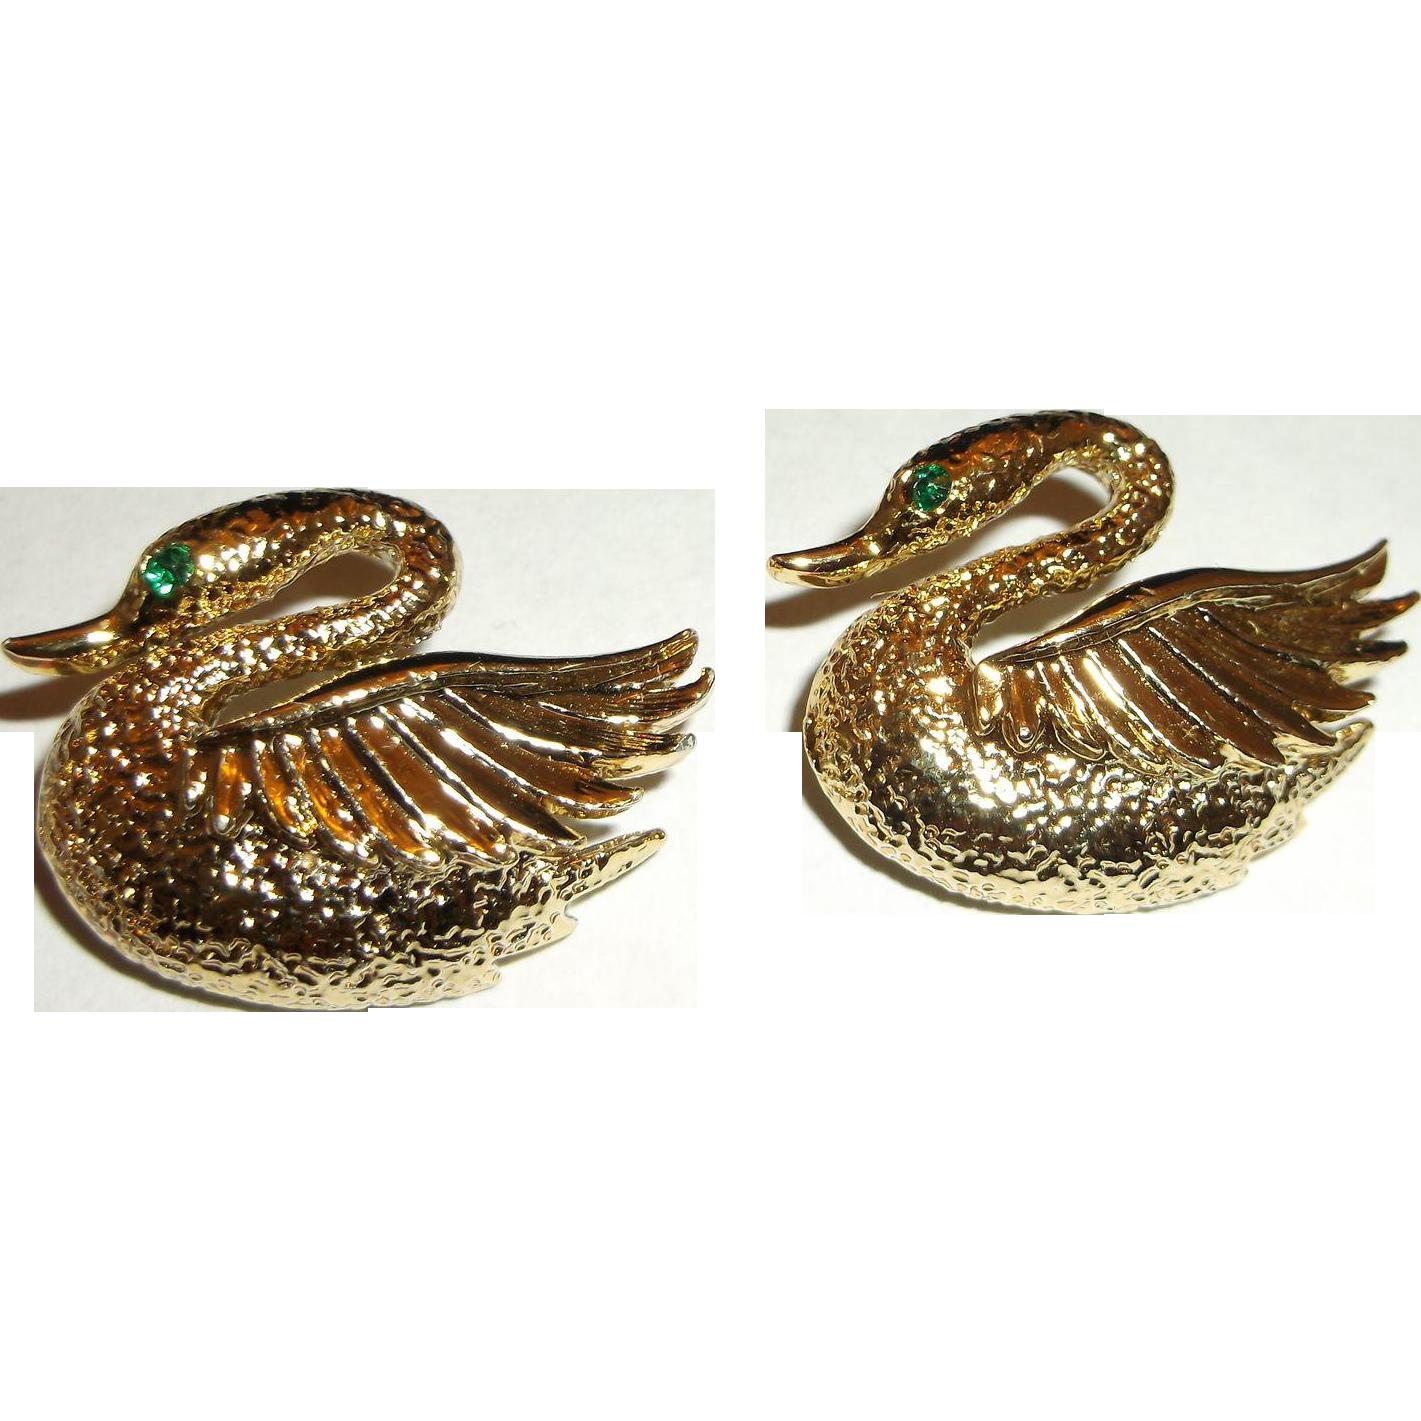 Swan Scatter Pins Gold Tone Emerald Green Rhinestone Eyes